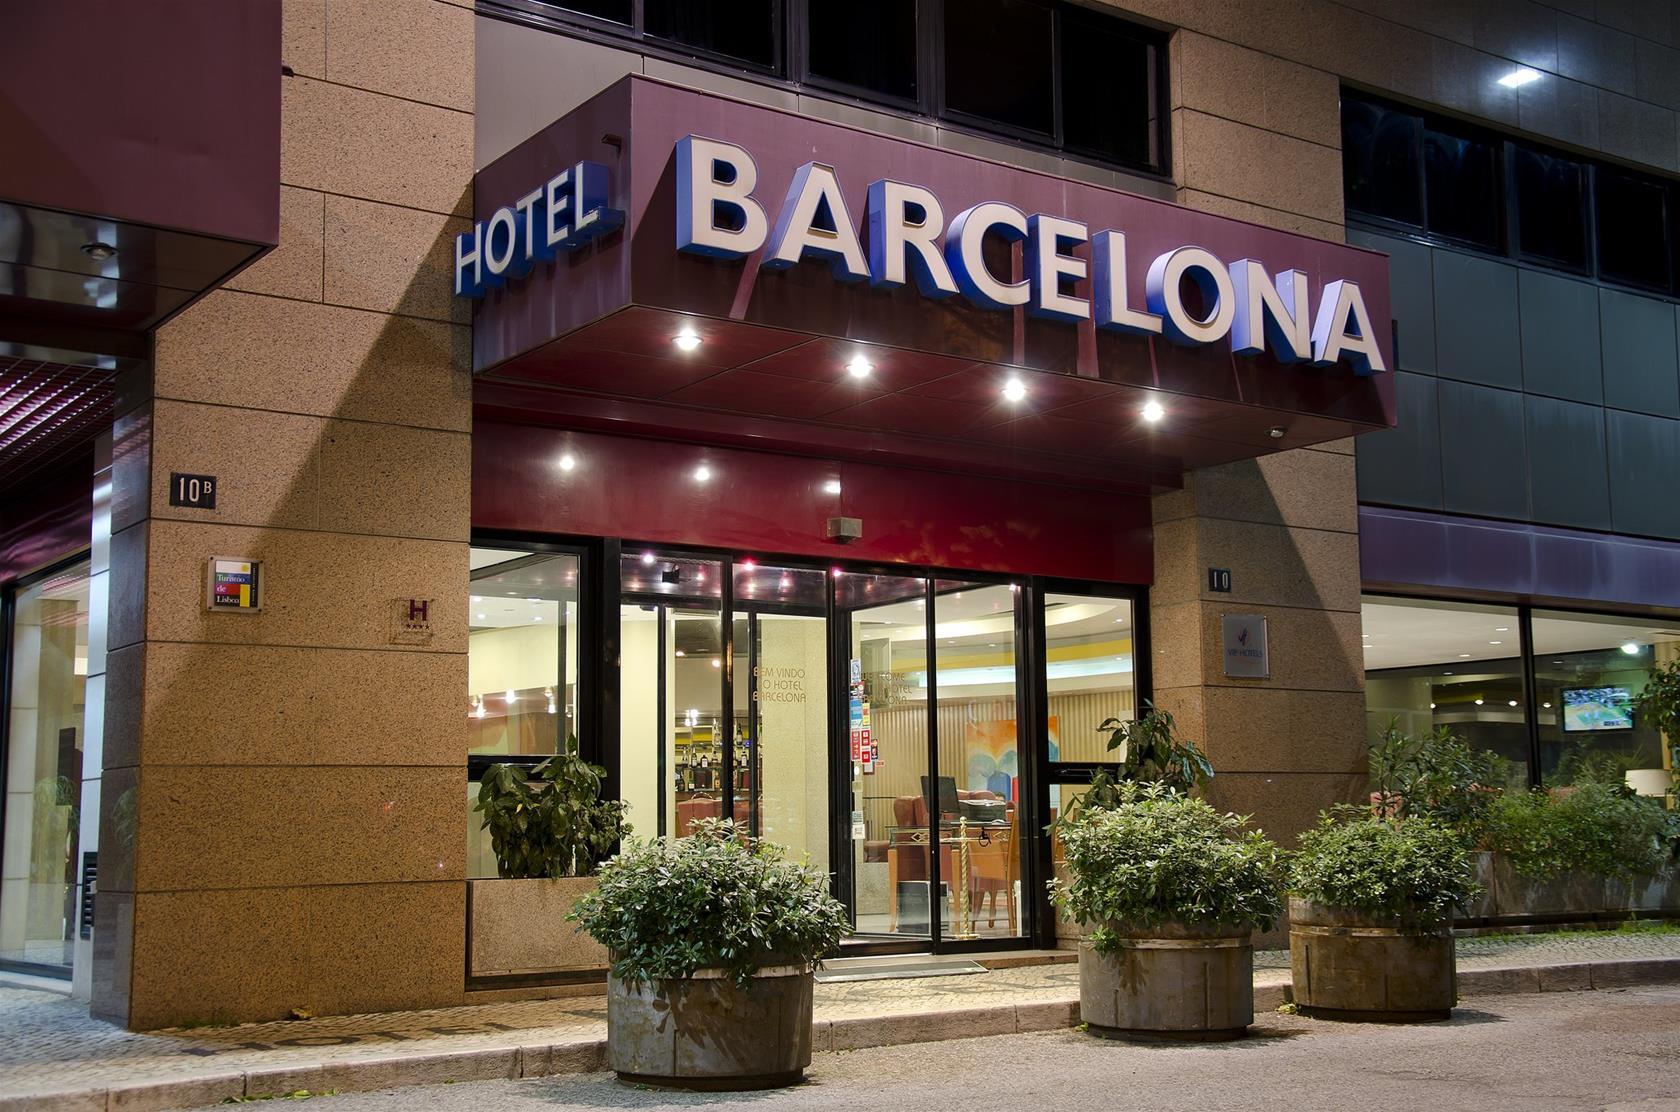 Trenes madrid lisboa desde 28 ofertas de billetes ave for Ave hotel barcelona madrid